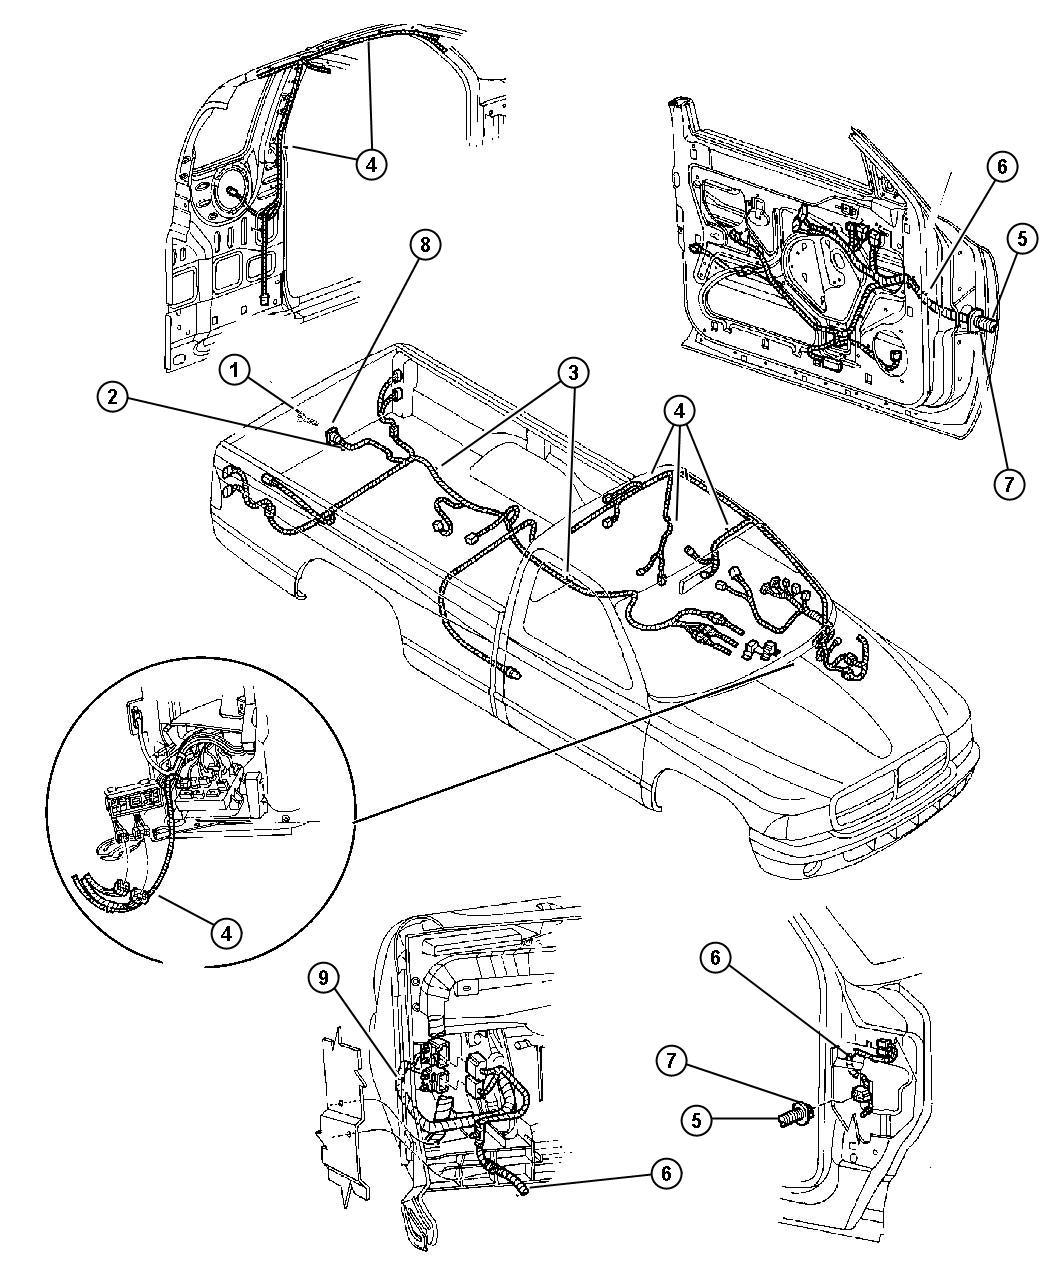 Dodge Dakota Wiring Used For Chmsl And Dome Jumper